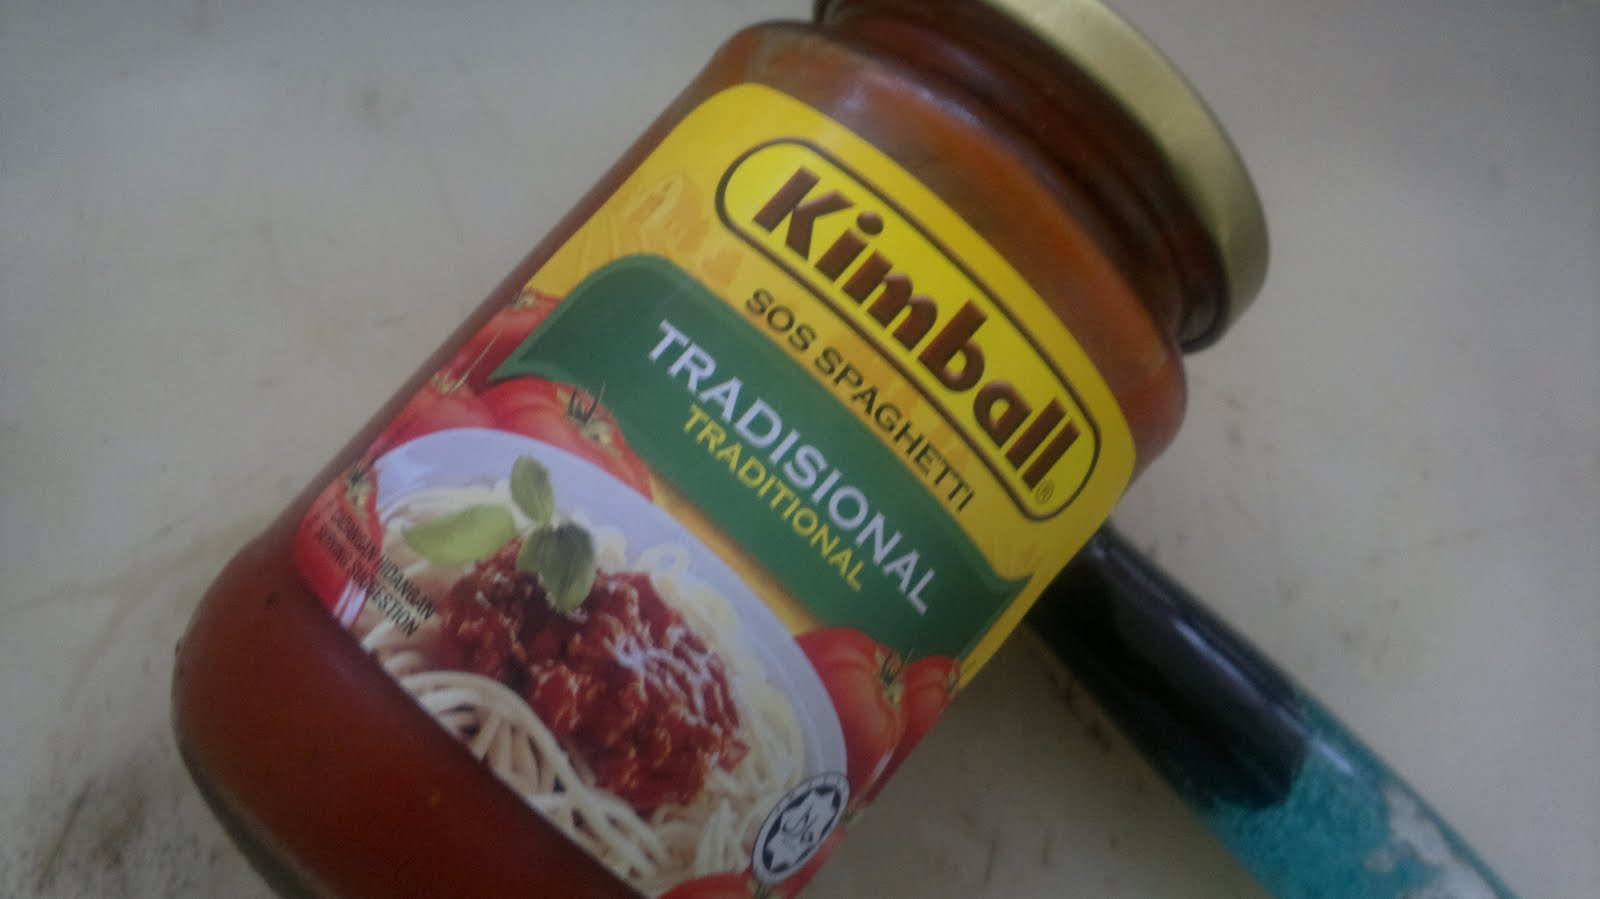 Resepi Spaghetti Sos Kimball Tradisional Brad Erva Doce Info